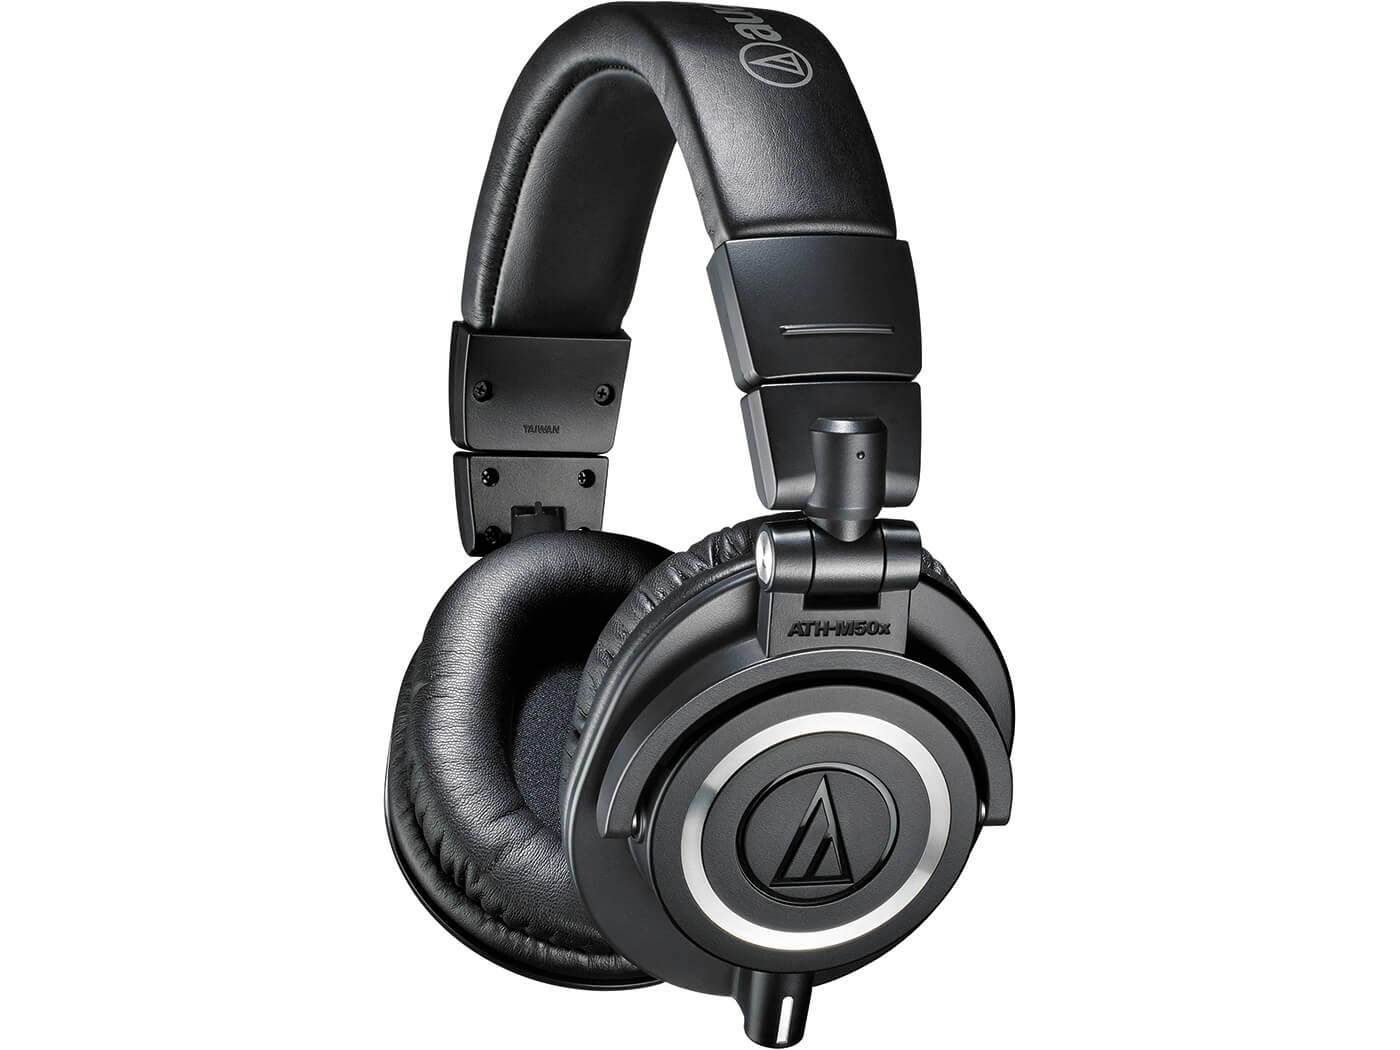 GOTD Audio Technica ATH-M50x